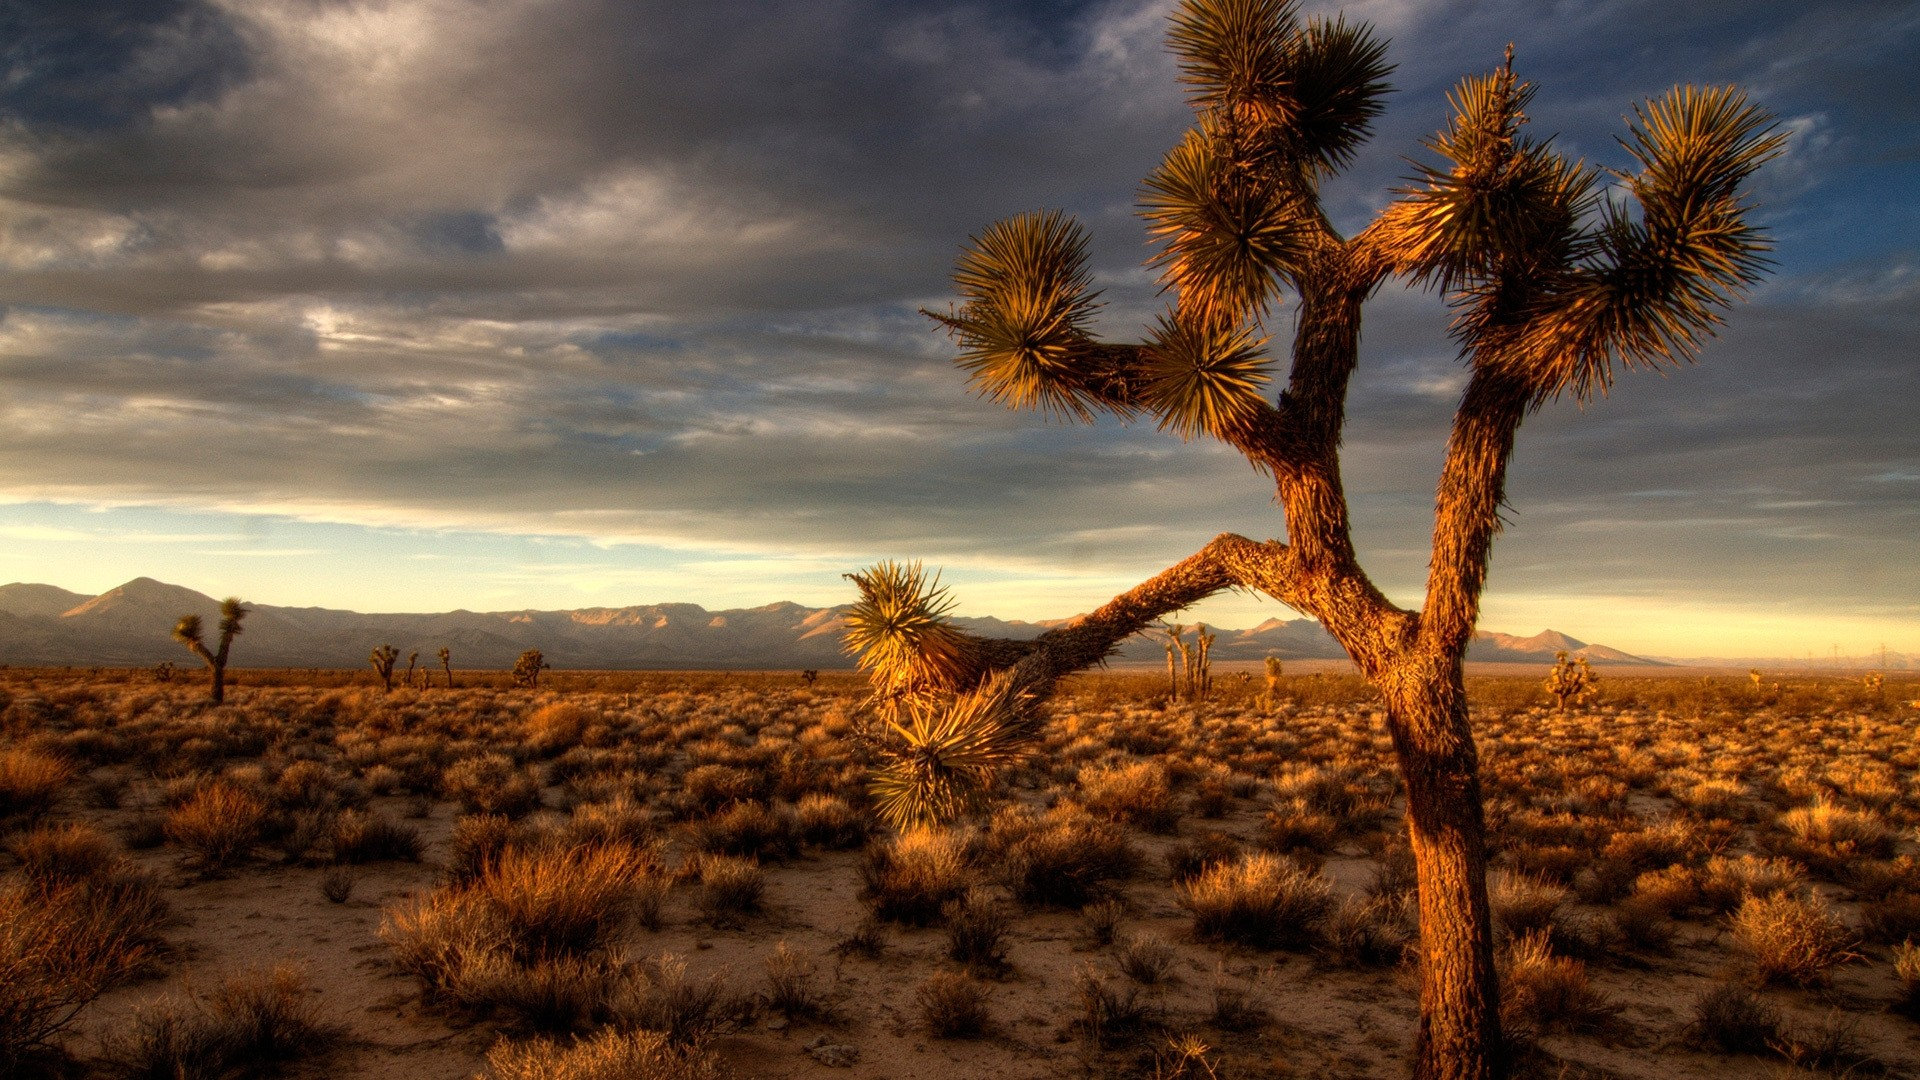 Desert Download Wallpaper